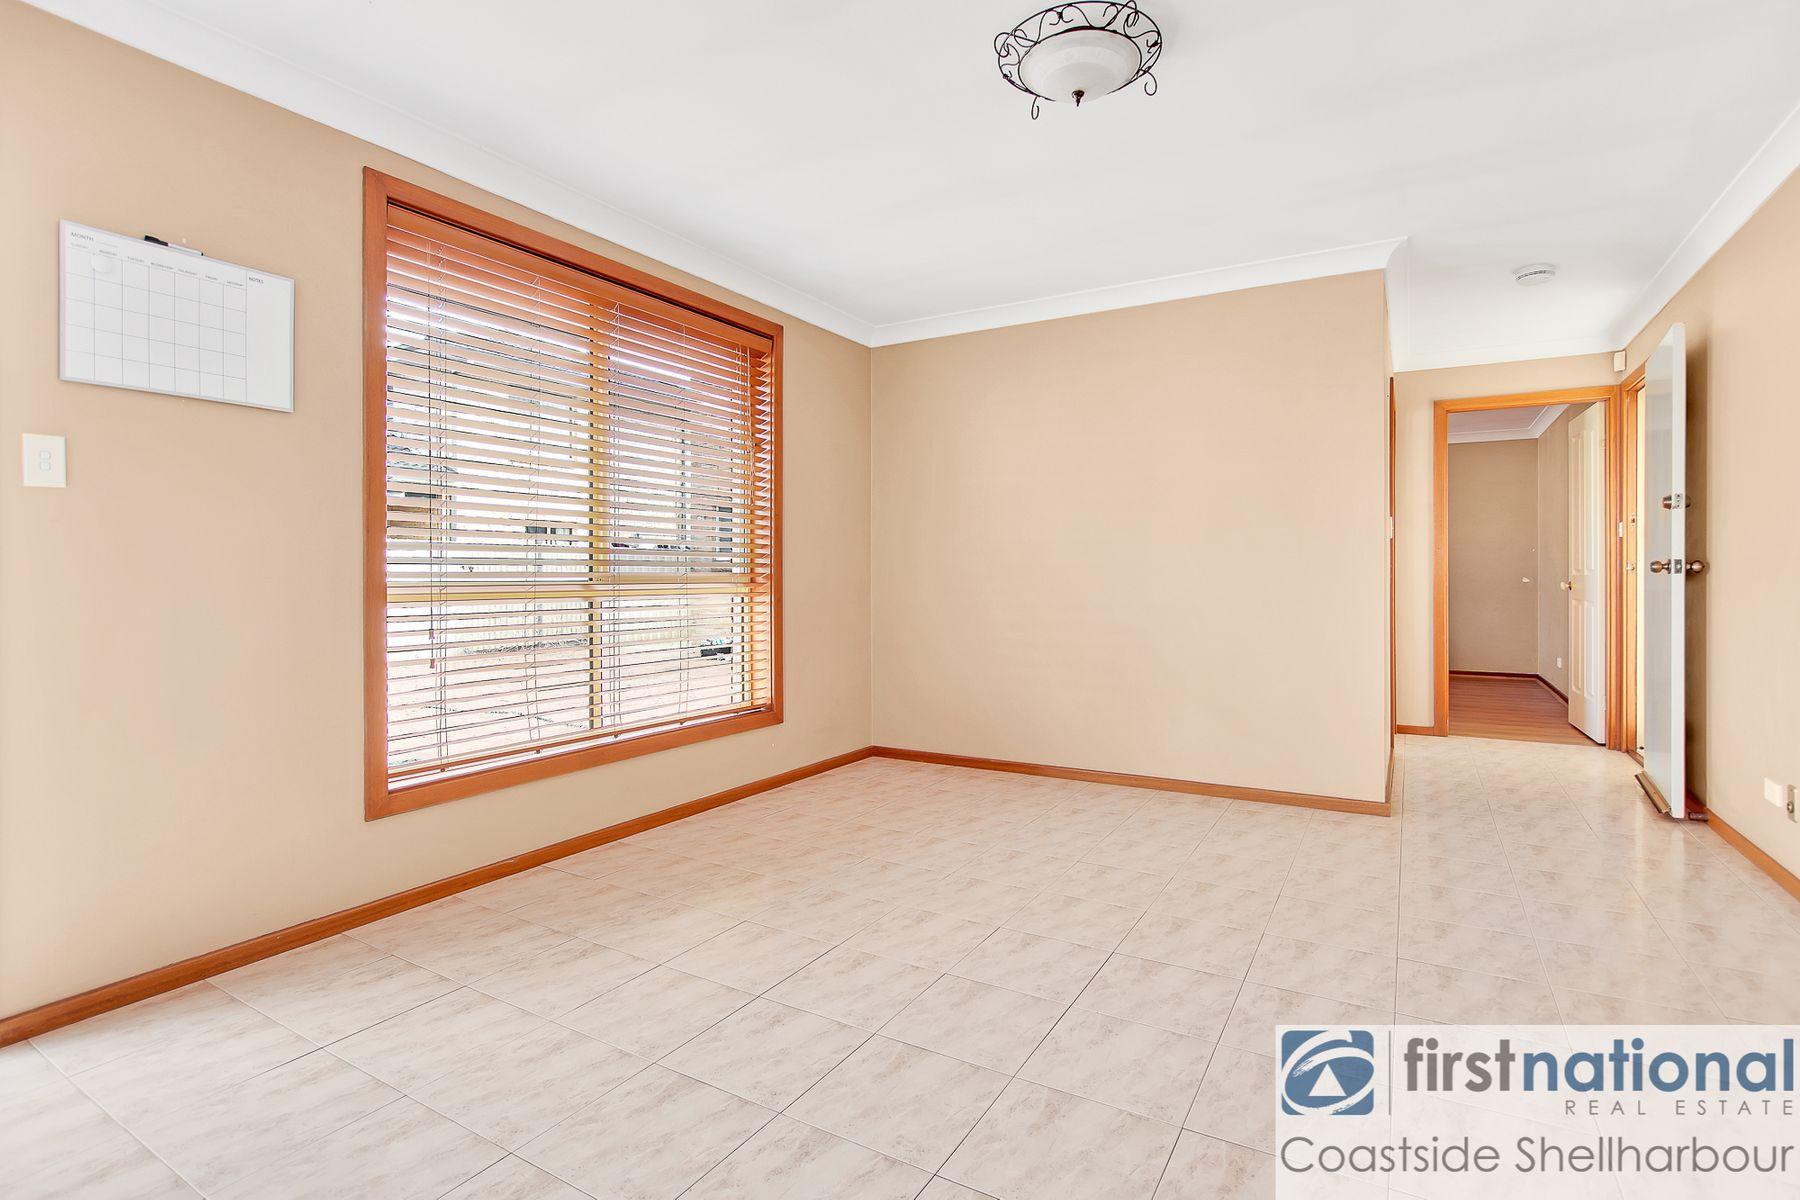 32A Barrack Avenue, Barrack Heights, NSW 2528